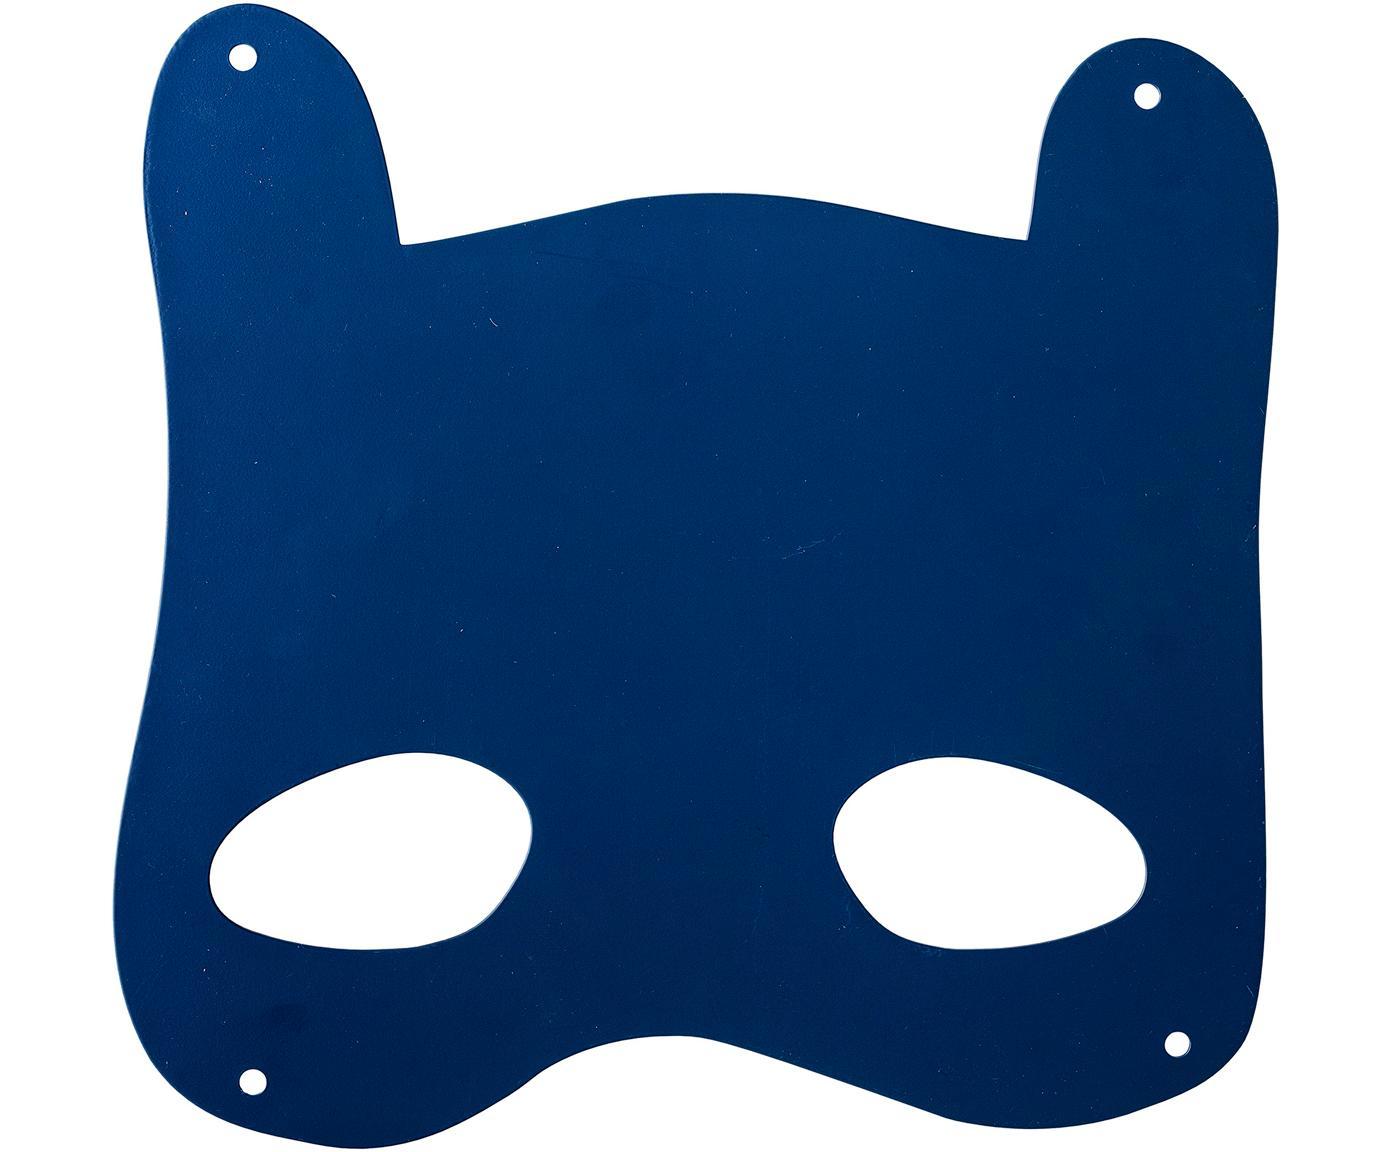 Lavagnetta magnetica da parete Mask, Metallo rivestito, Blu, Larg. 33 x Alt. 31 cm